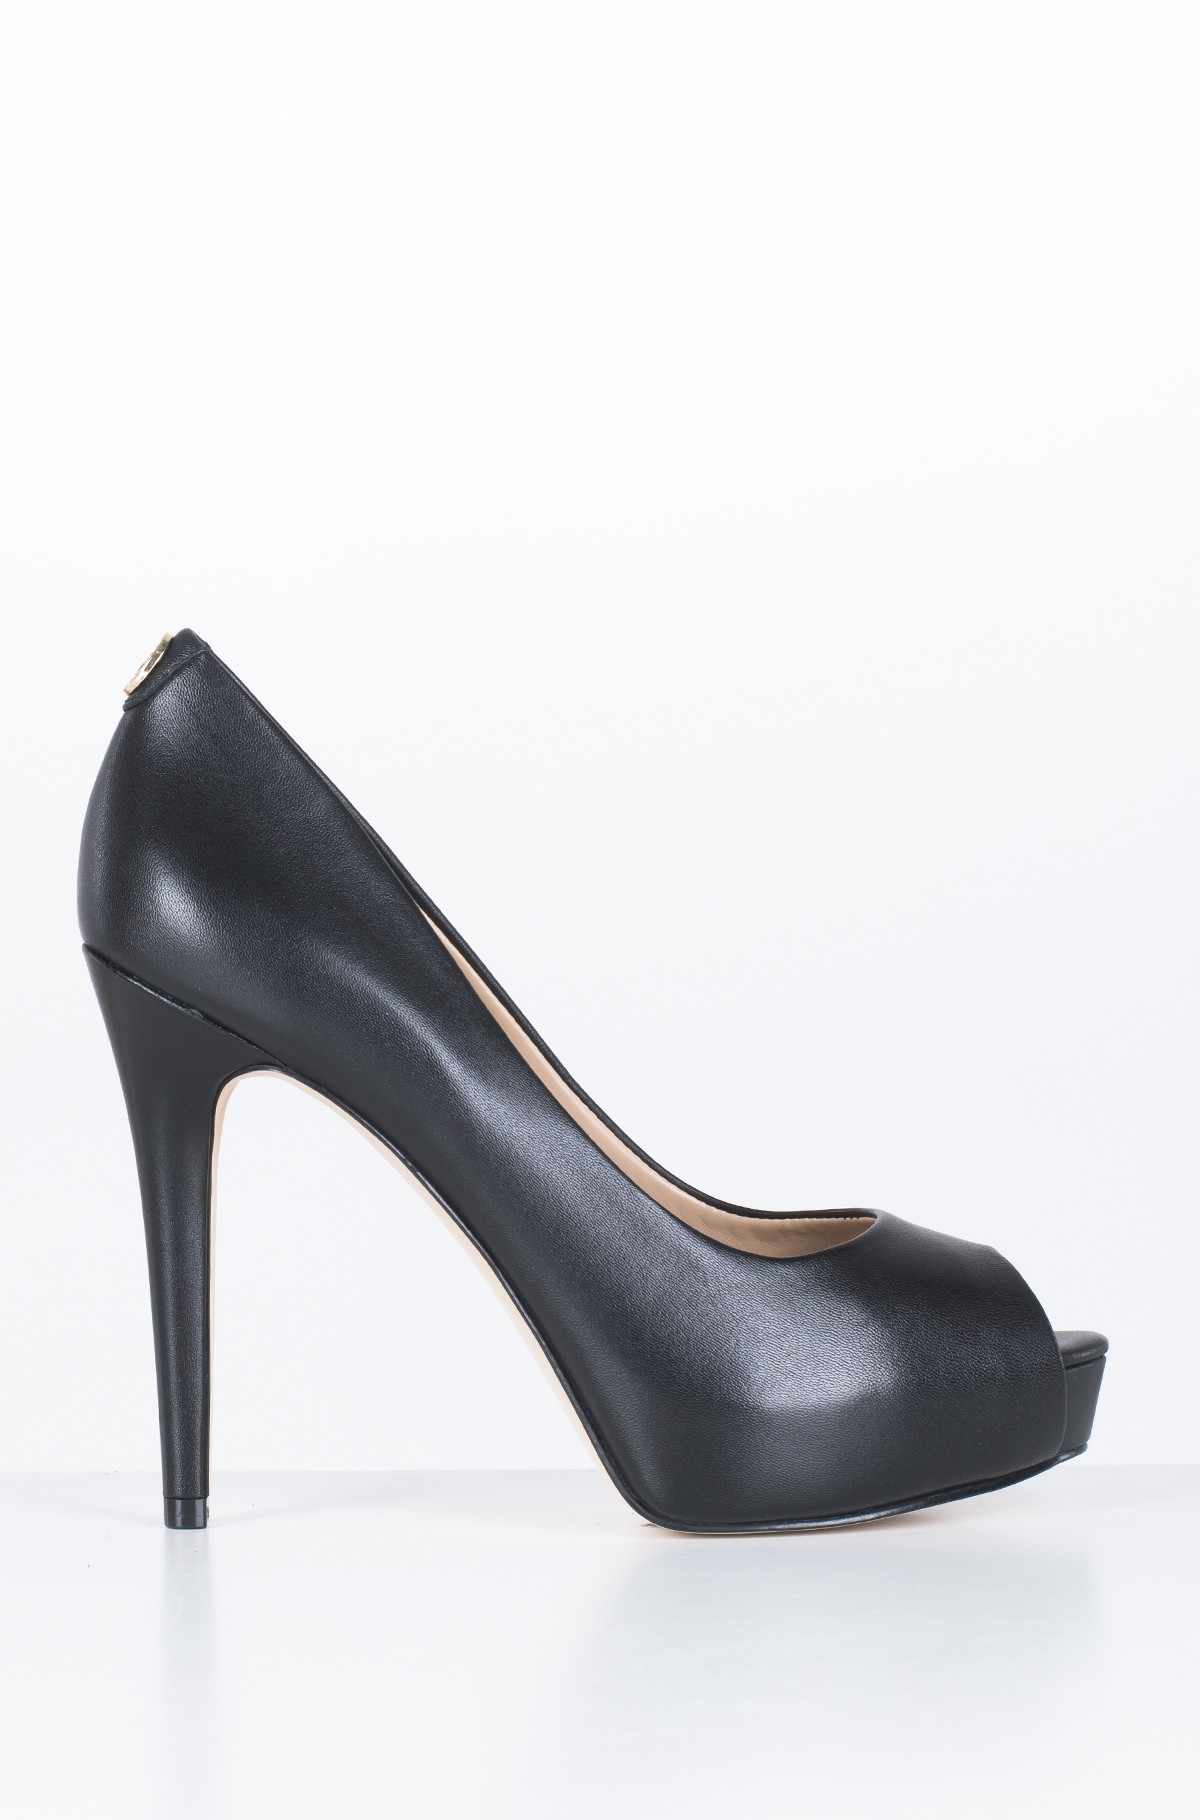 Shoes FLH124 LEA07-full-1